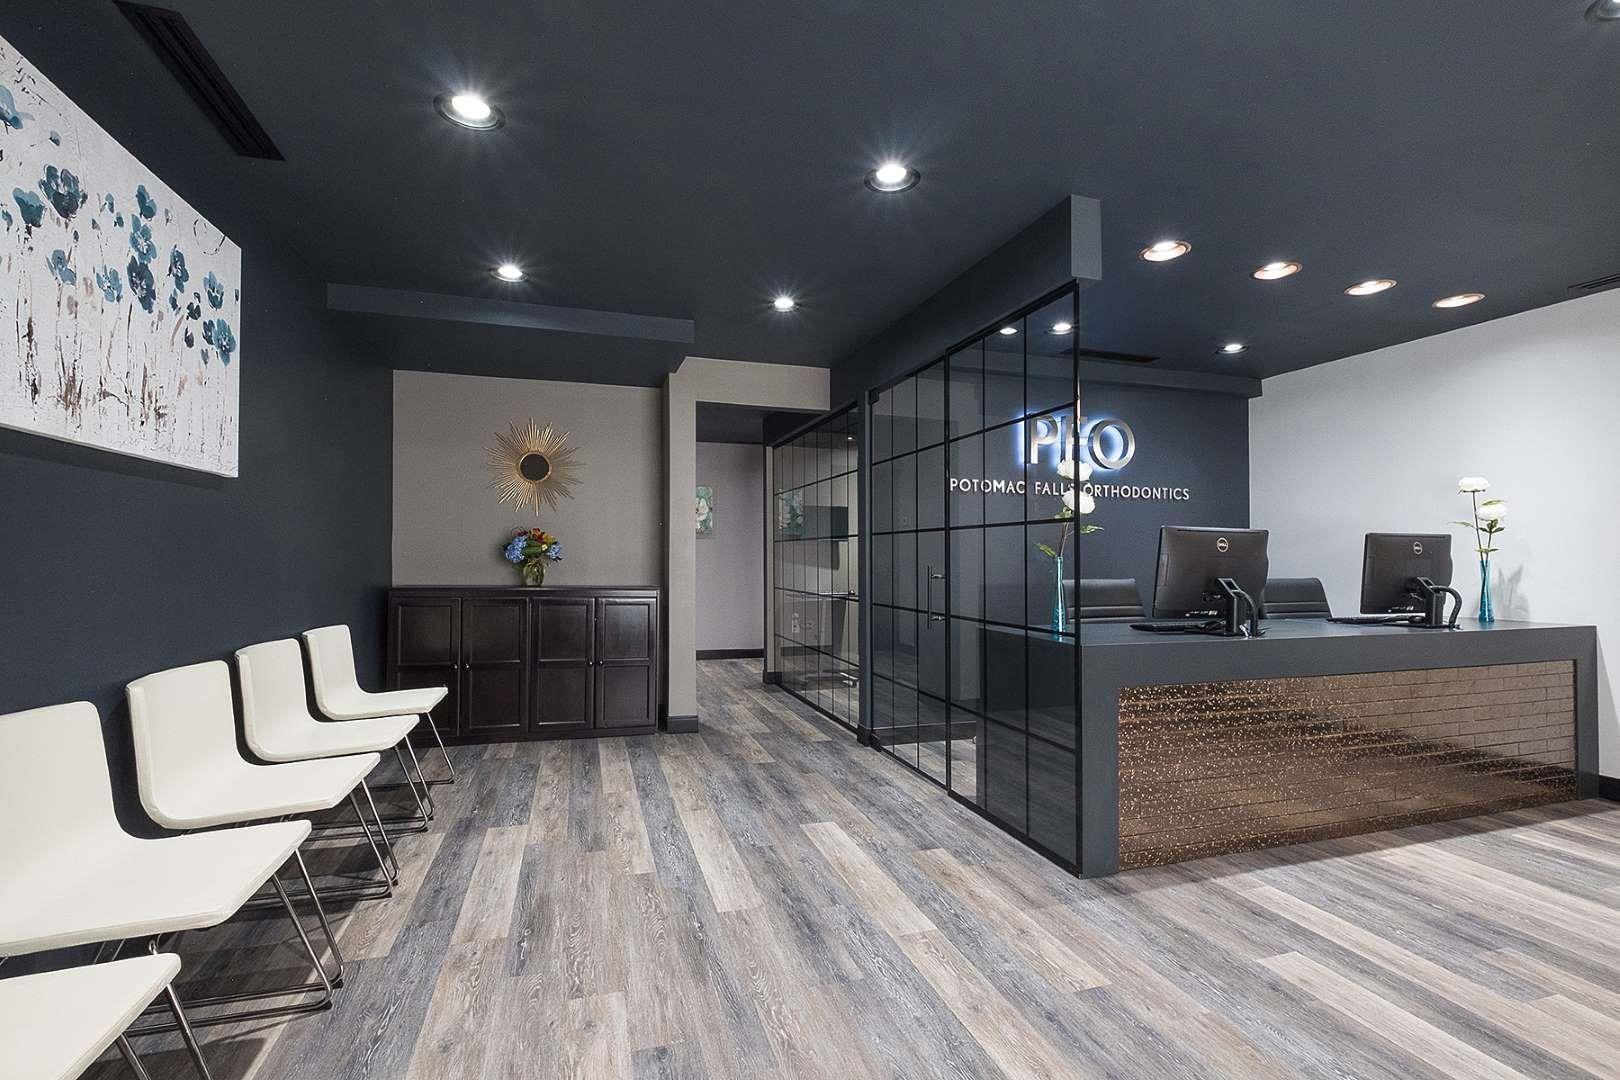 Potomac Falls Orthodontics Interior Design Portfolio Dental